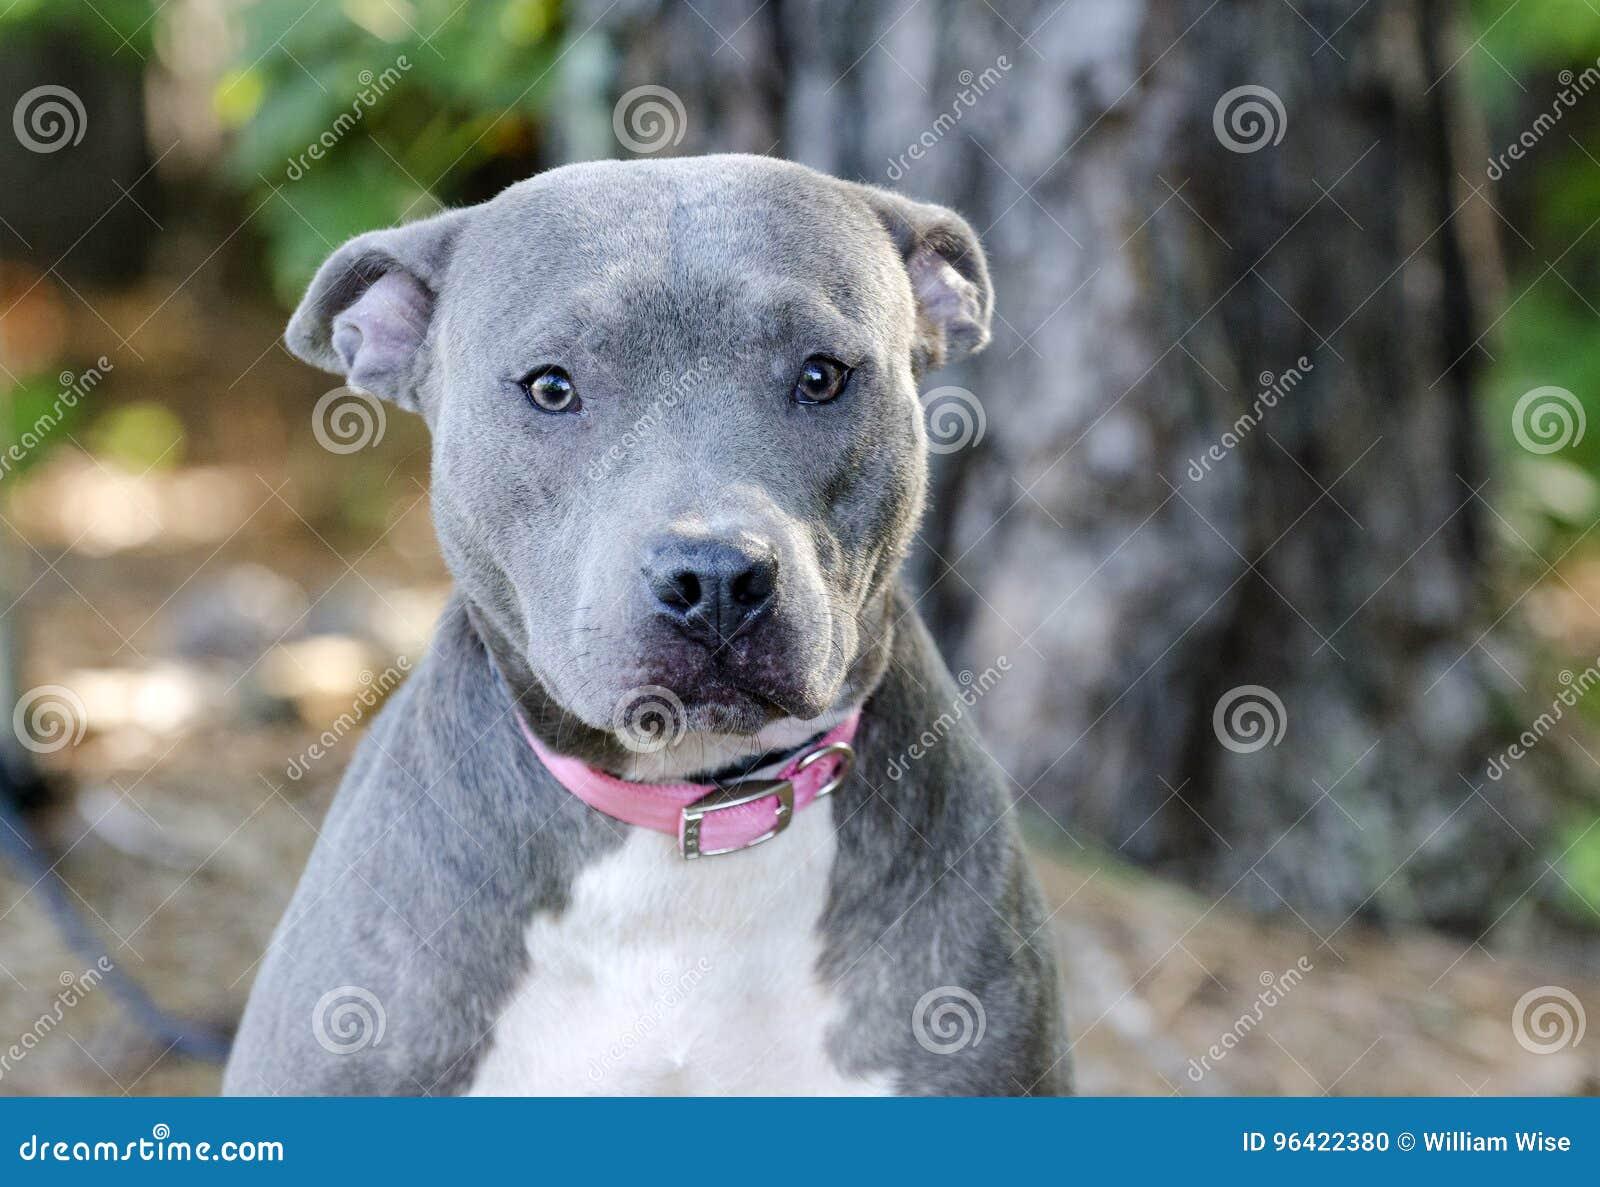 Blue American Pitbull Terrier Dog Stock Photo - Image of